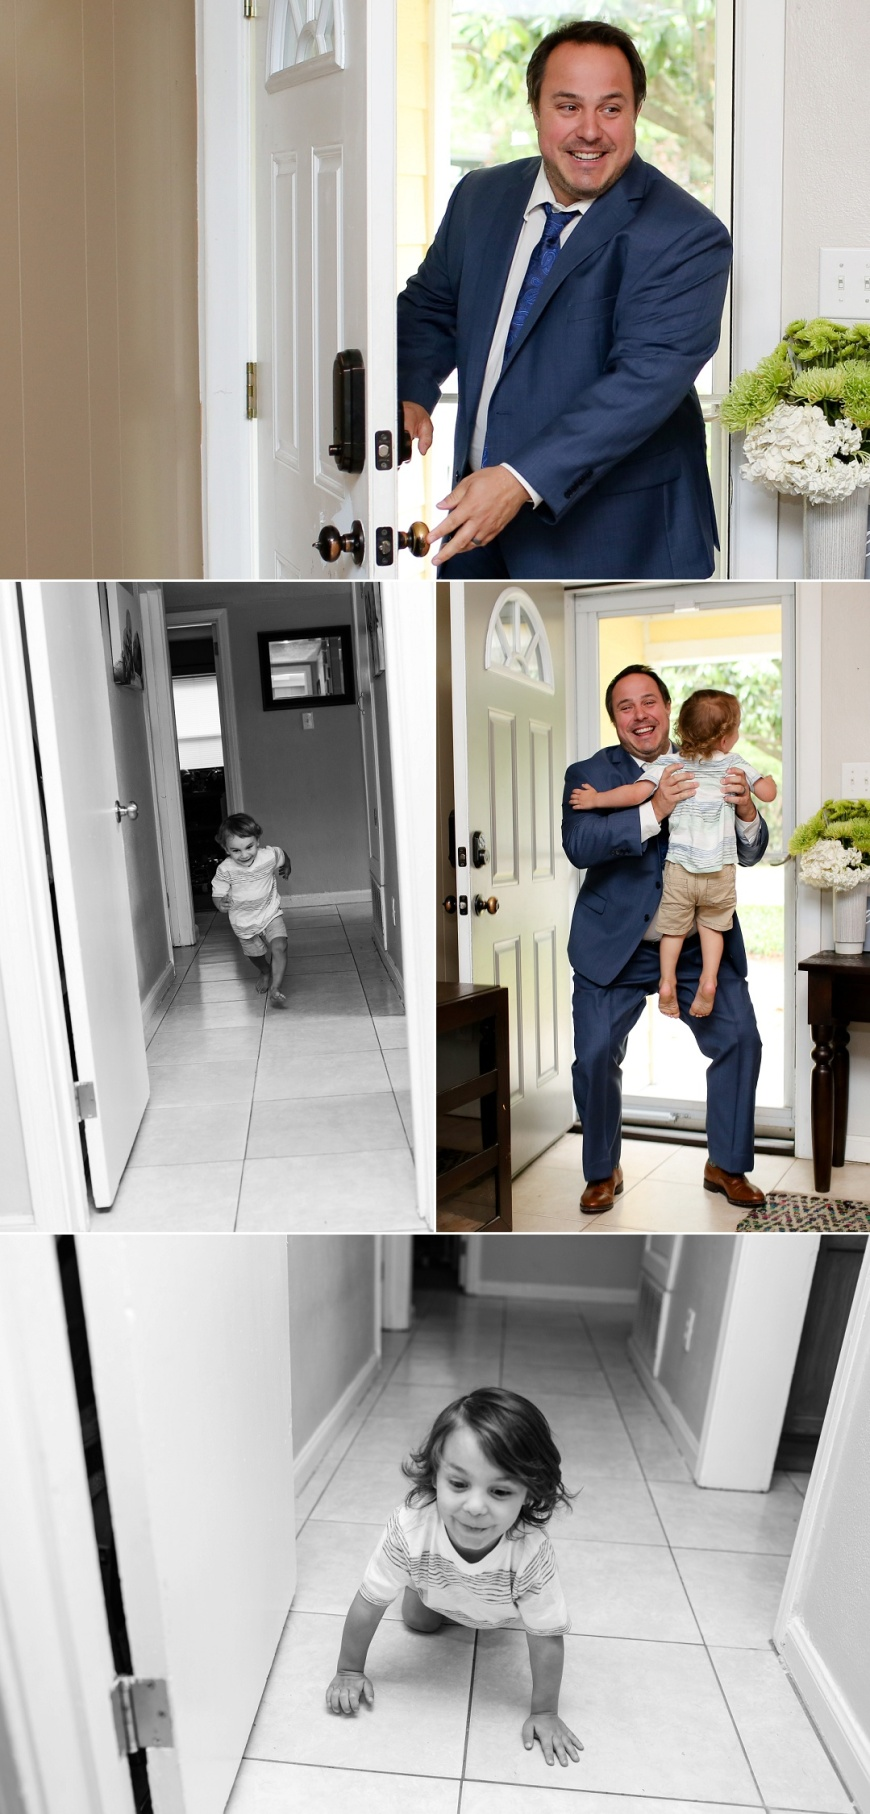 Pensacola-Family-Photographer-Bruni (122).jpg